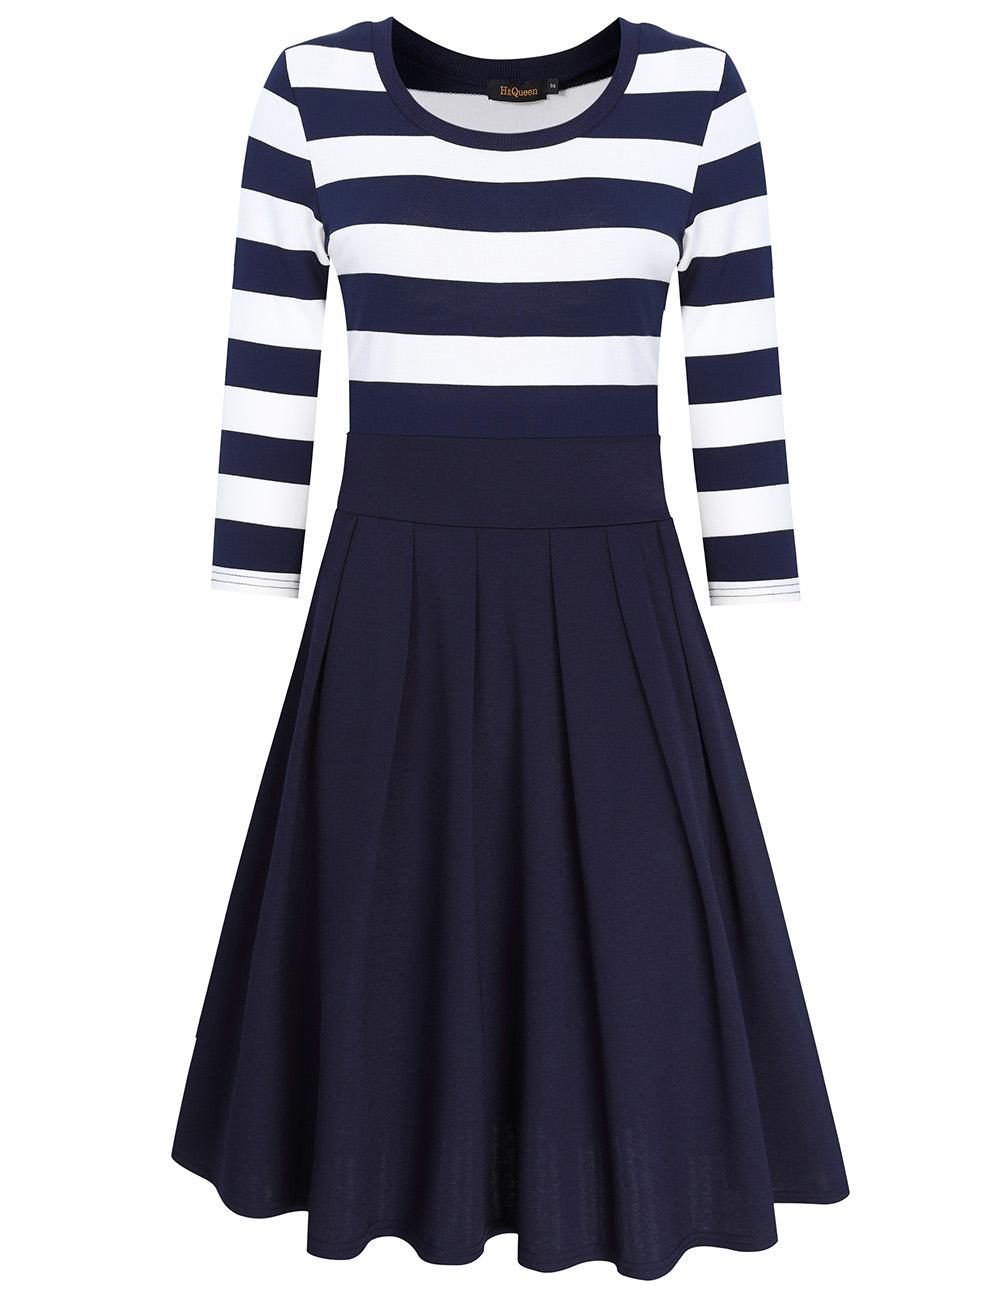 HiQueen Women Casual Scoop Neck 3/4 Sleeve A-Line Swing Dress Stripe Modest Dresses Dark blue_M